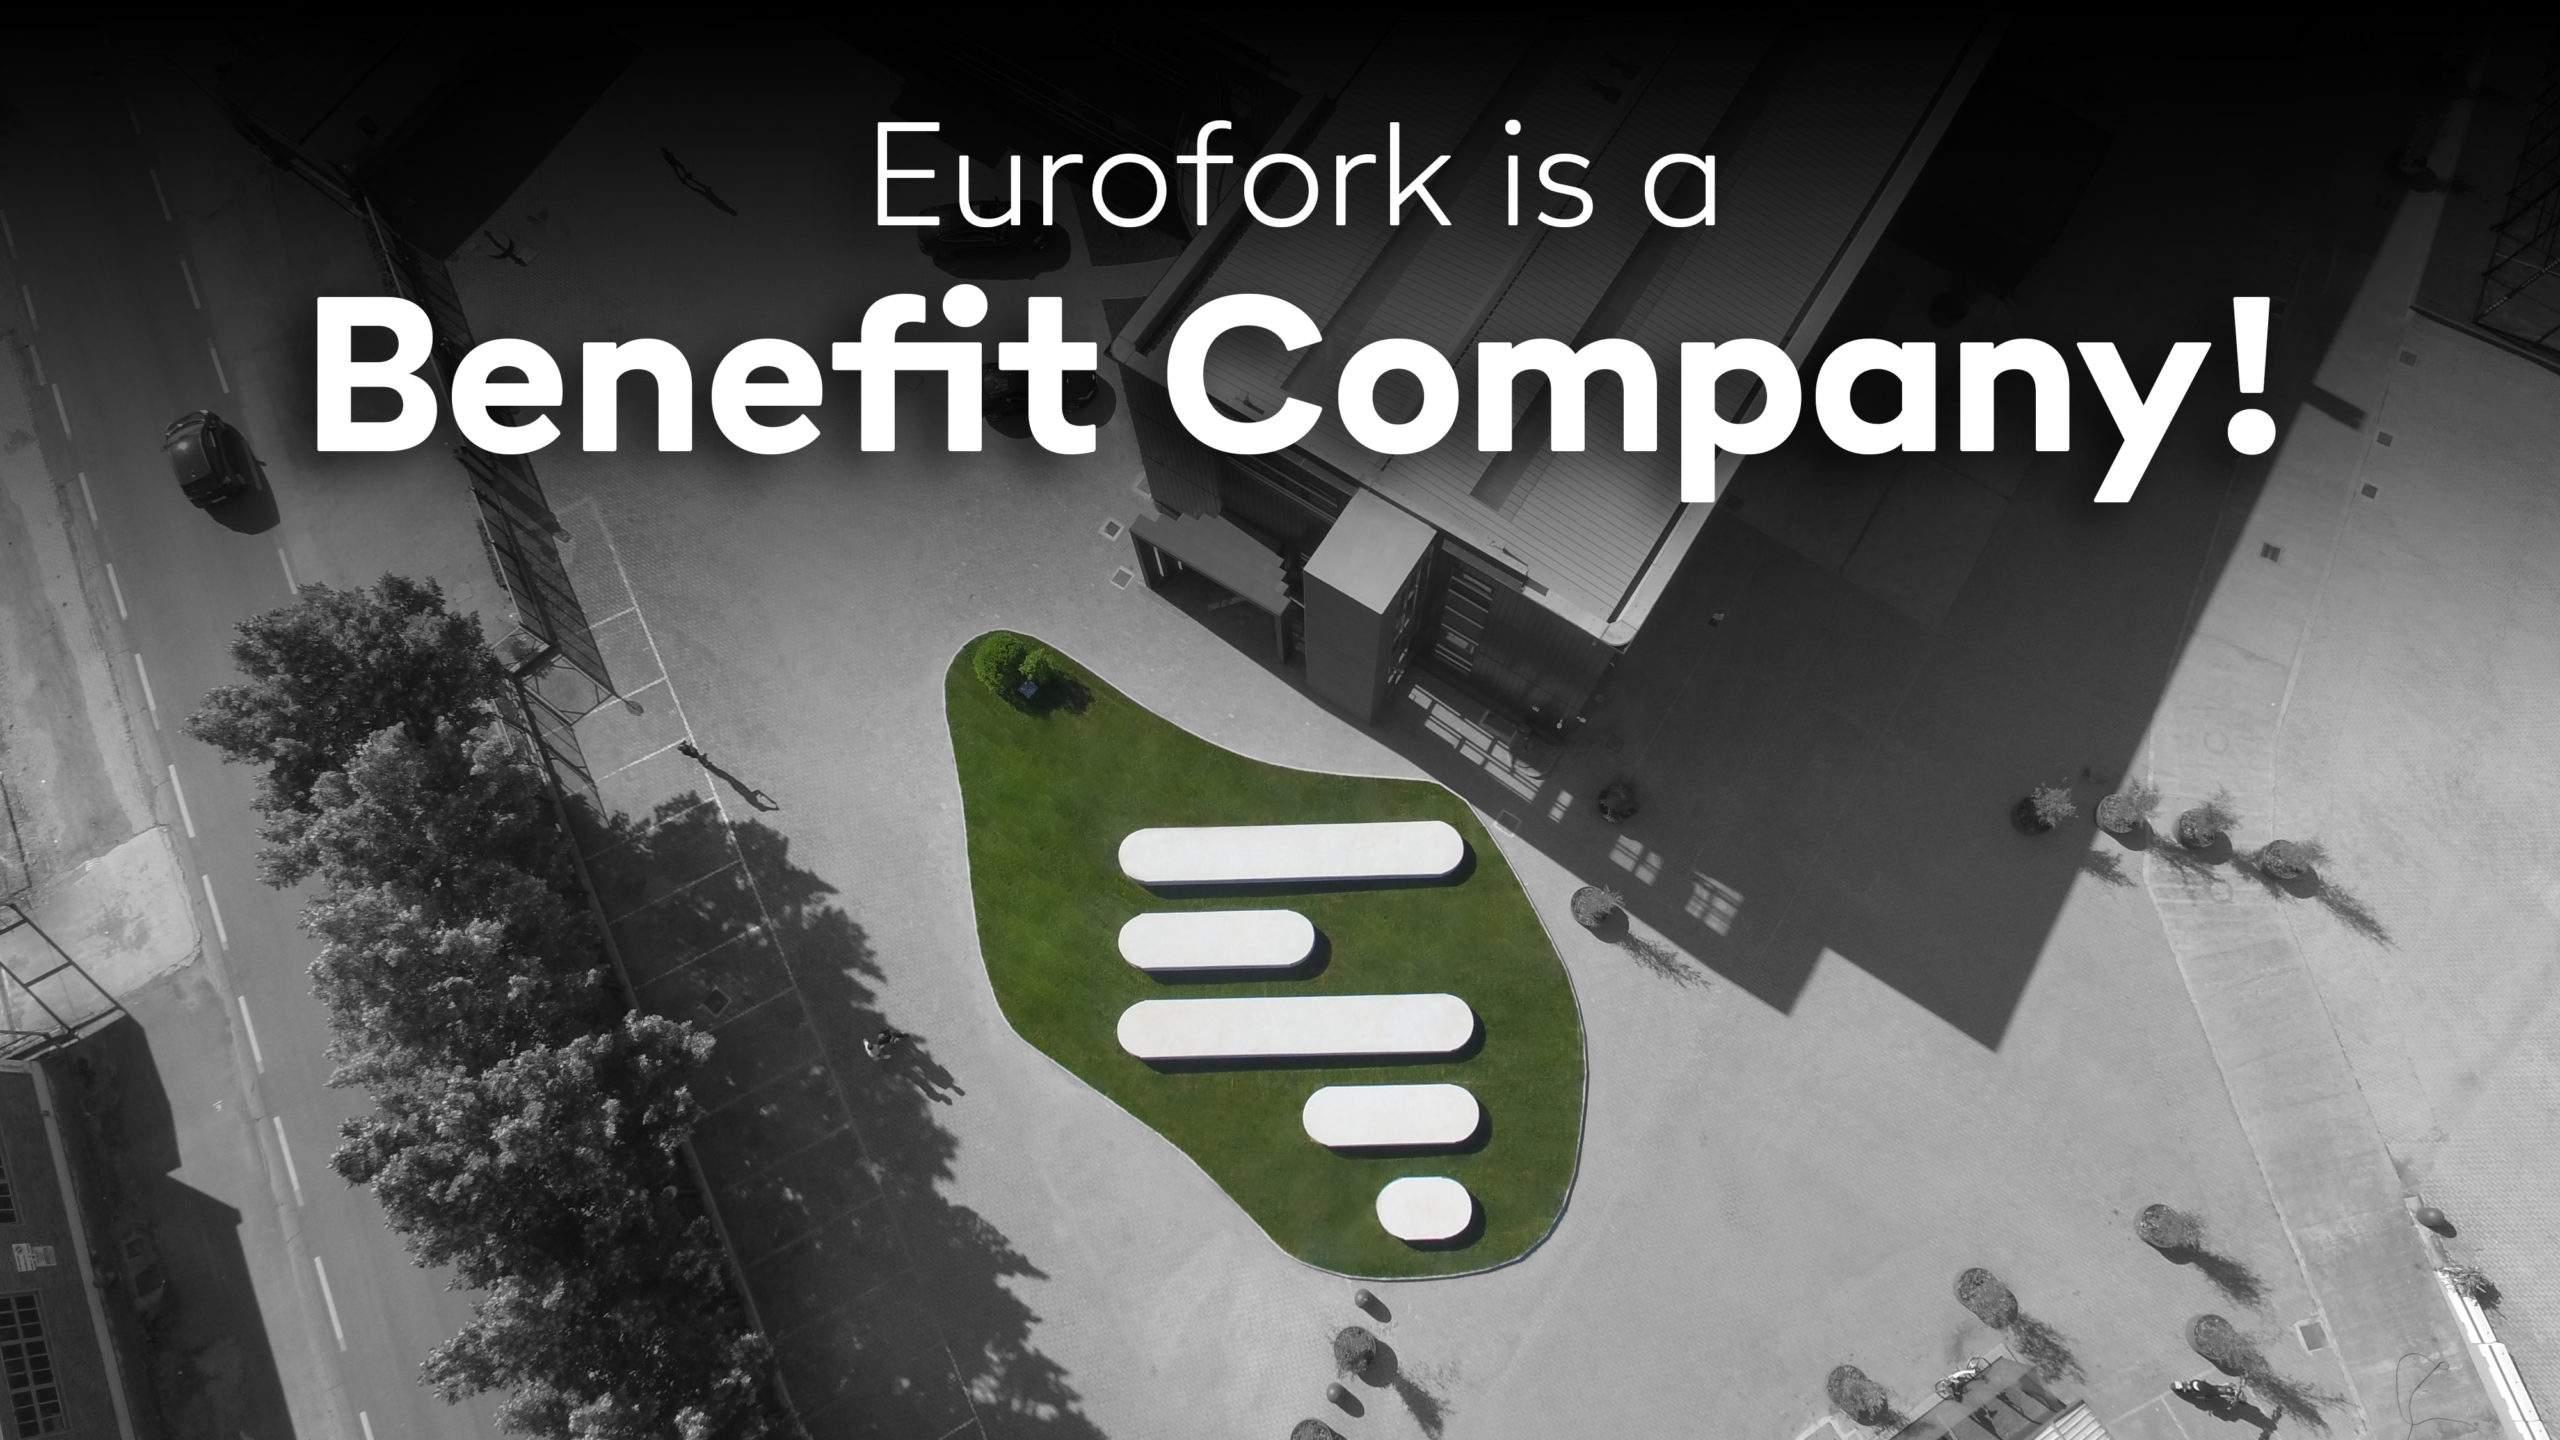 Eurofork is a Benefit Company!